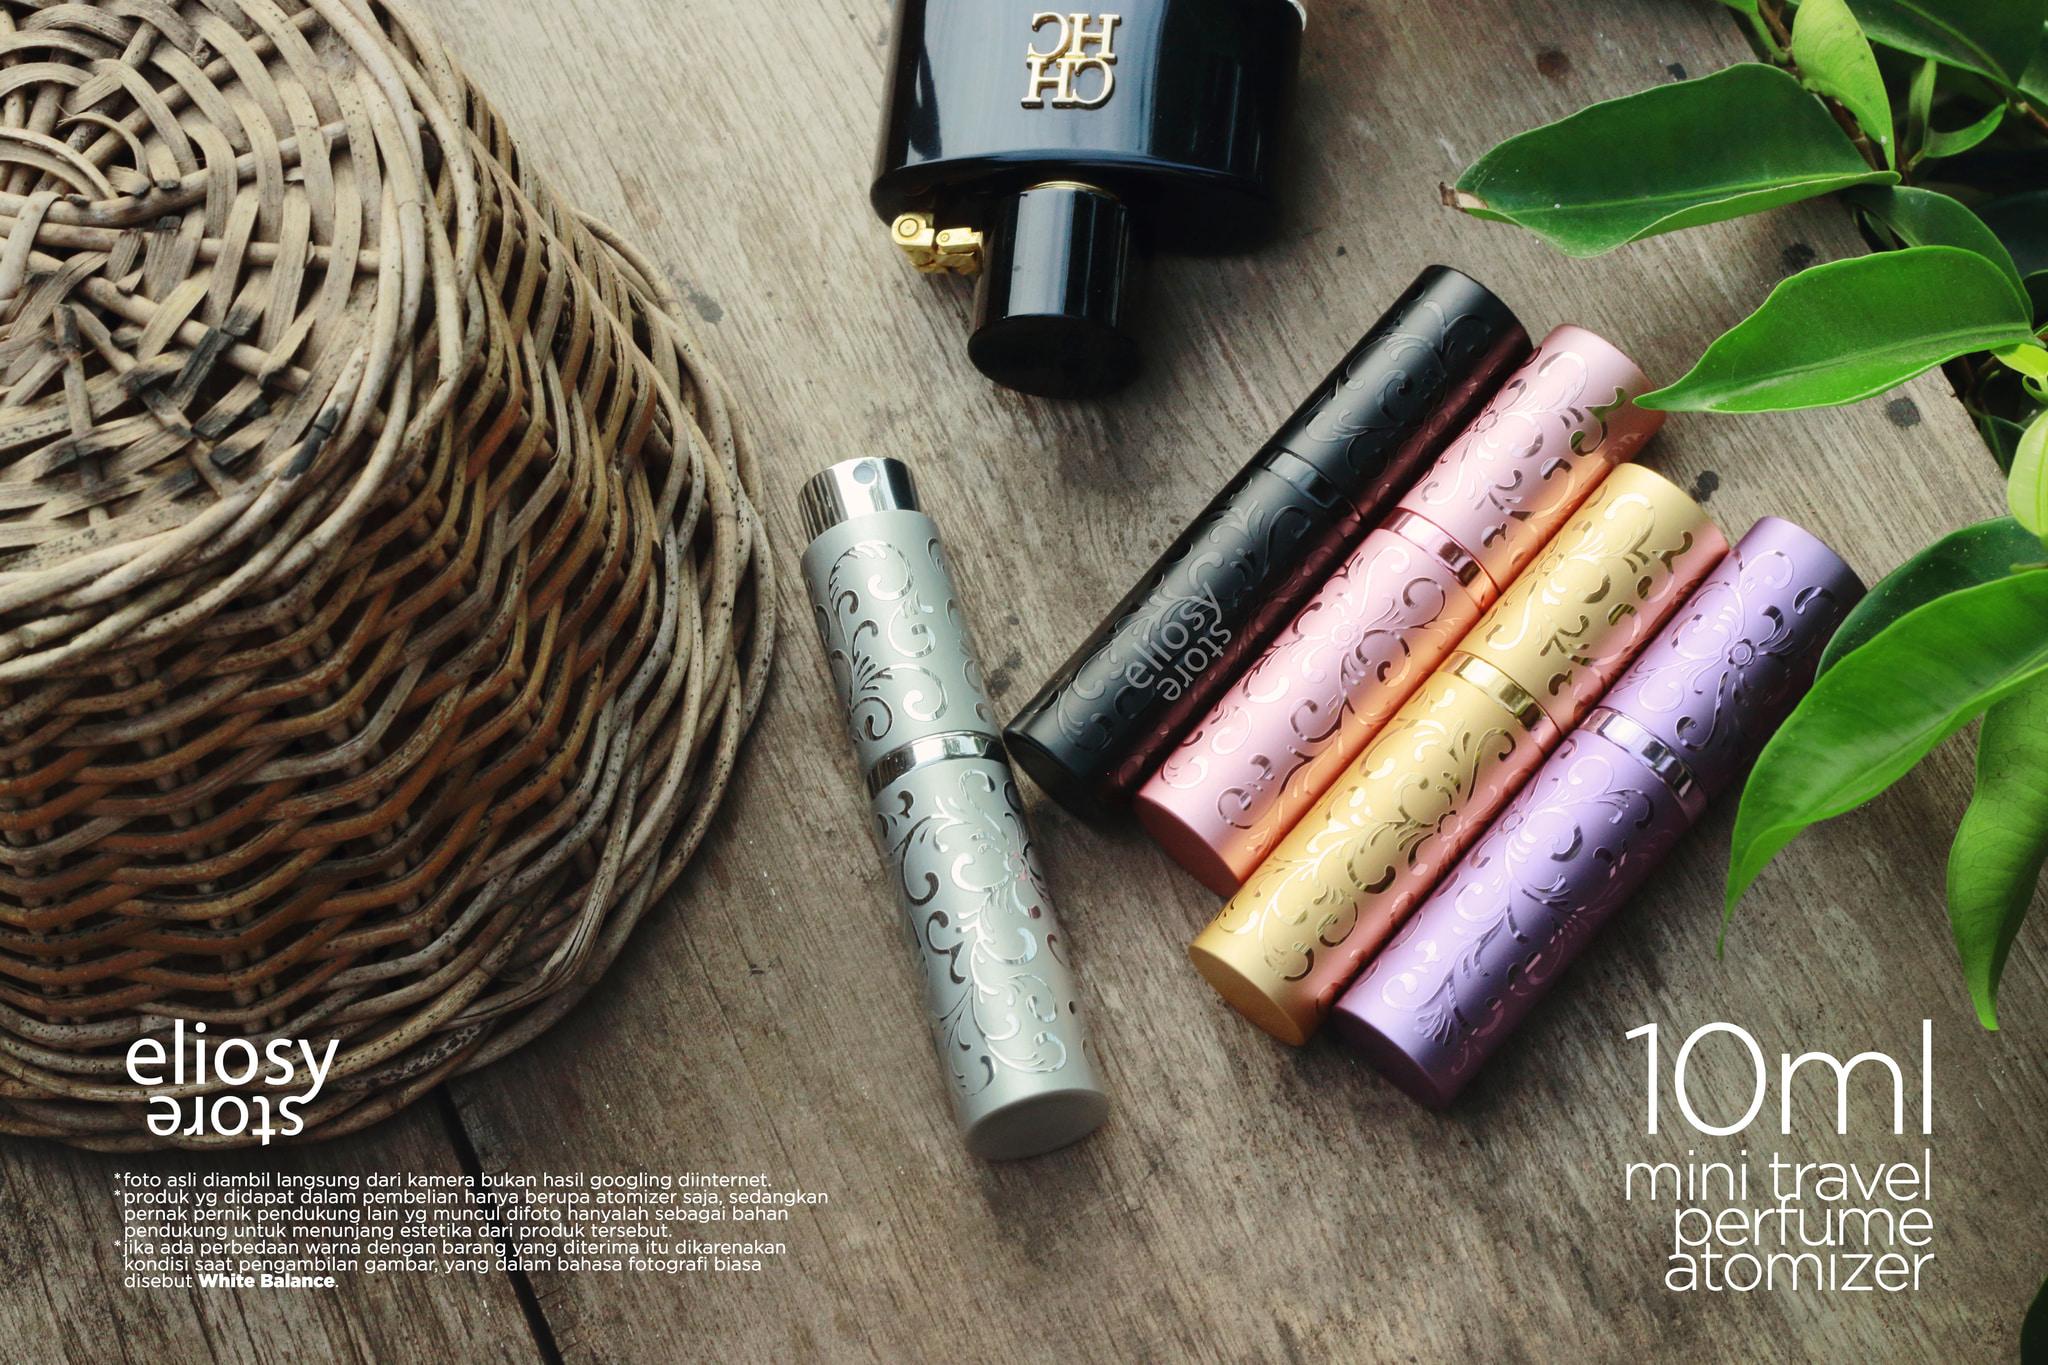 Jual Termurah Travel Perfume Atomizer Spray Botol Parfum Isi Ulang Refillable Refill Eliosy Tokopedia